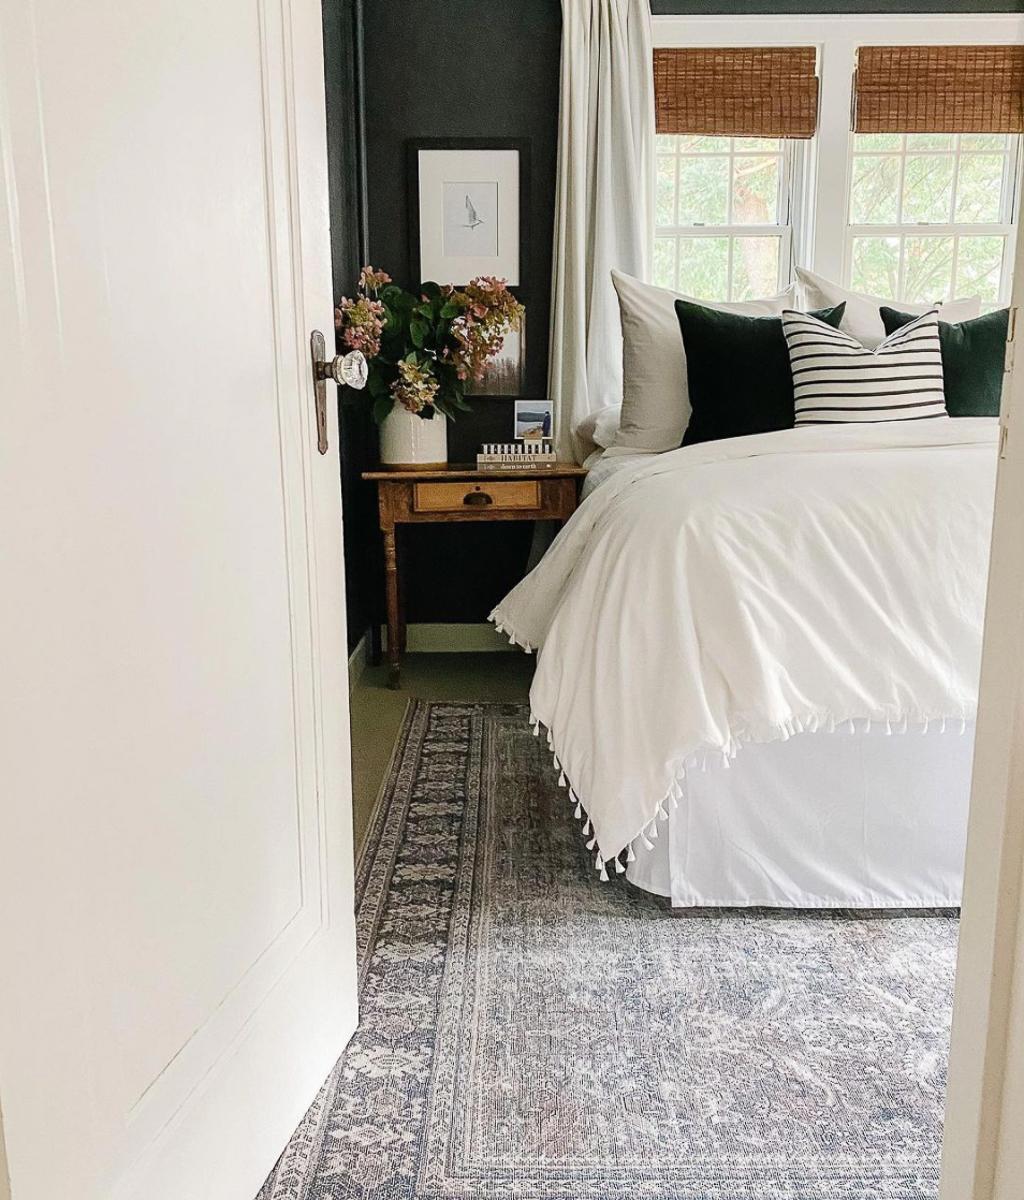 Black walls add drama to this master bedroom kellyelko.com